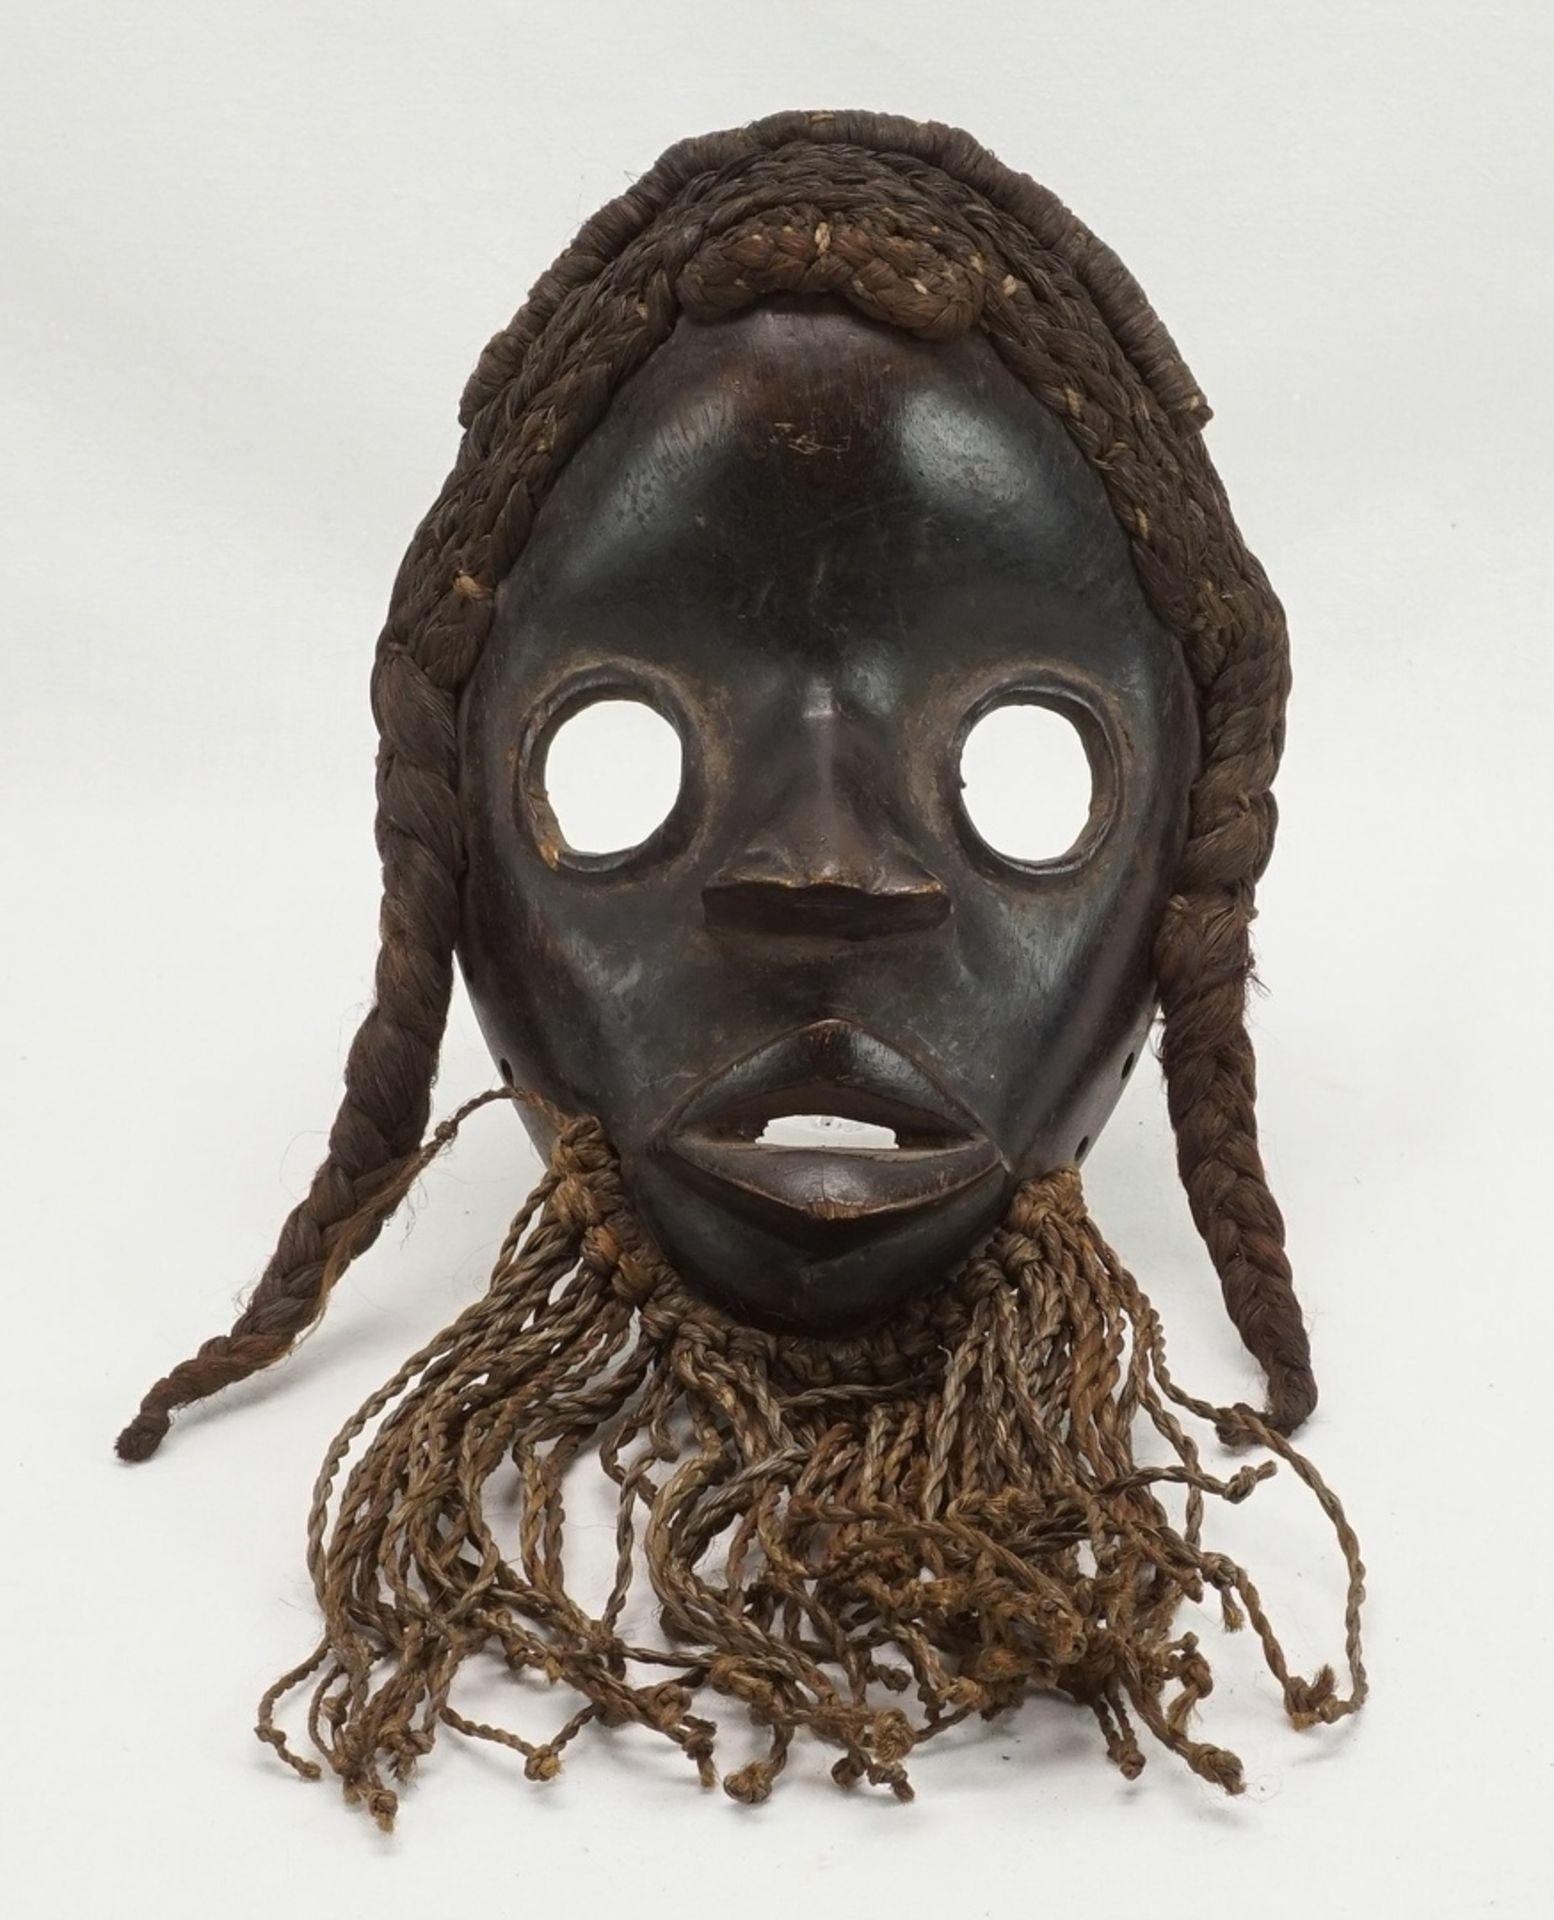 "Feuermeldermaske ""zakpai"", Dan, Elfenbeinküste (Côte d'Ivoire)"